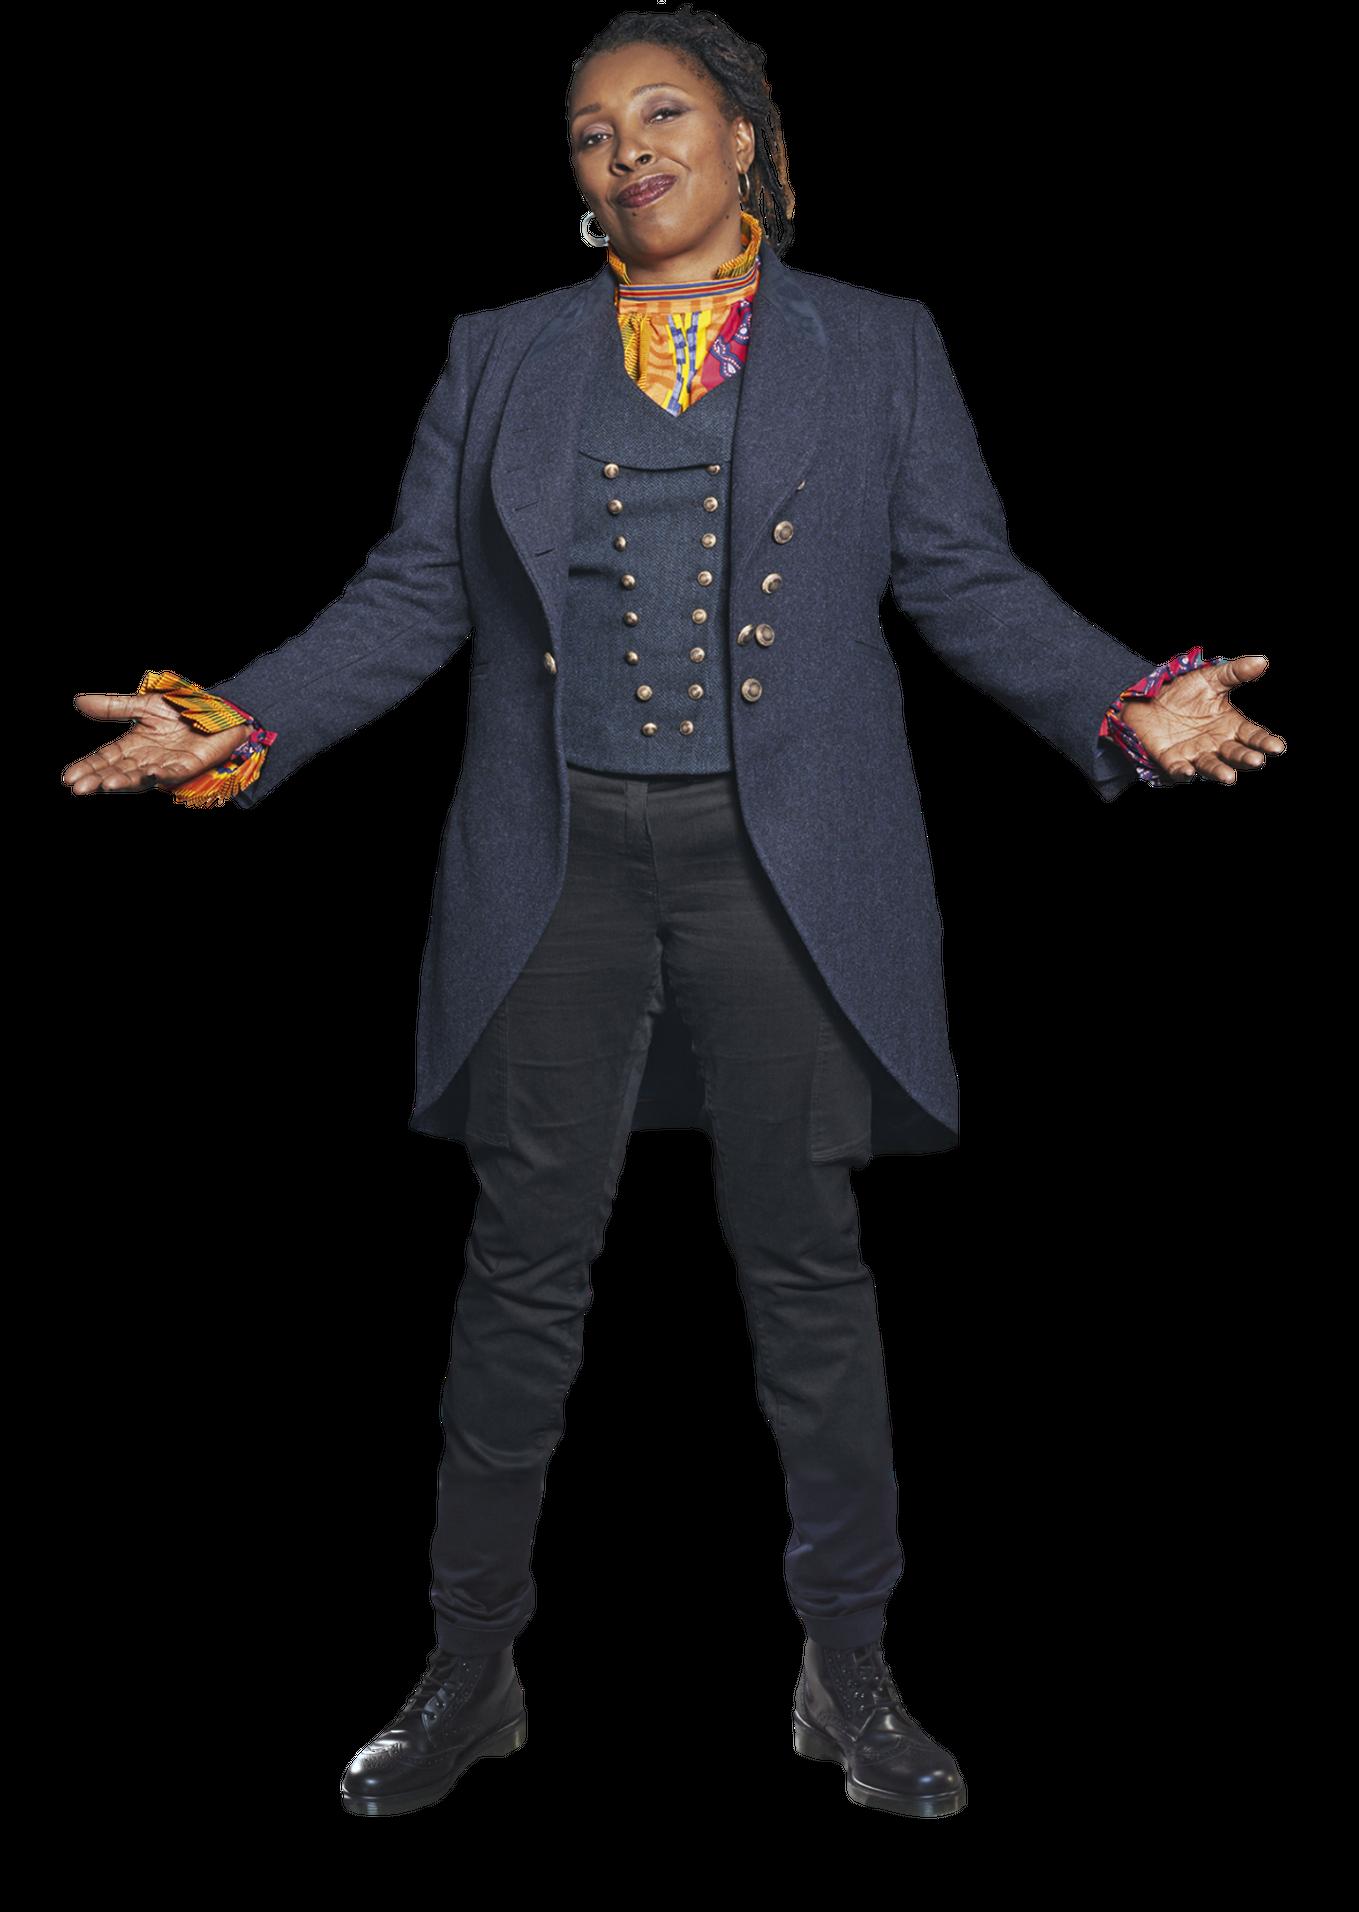 Https Www Deviantart Com Metropolis Hero1125 Art Doctor Who Ruth Doctor Png 832612694 Doctor Who Doctor Metropolis